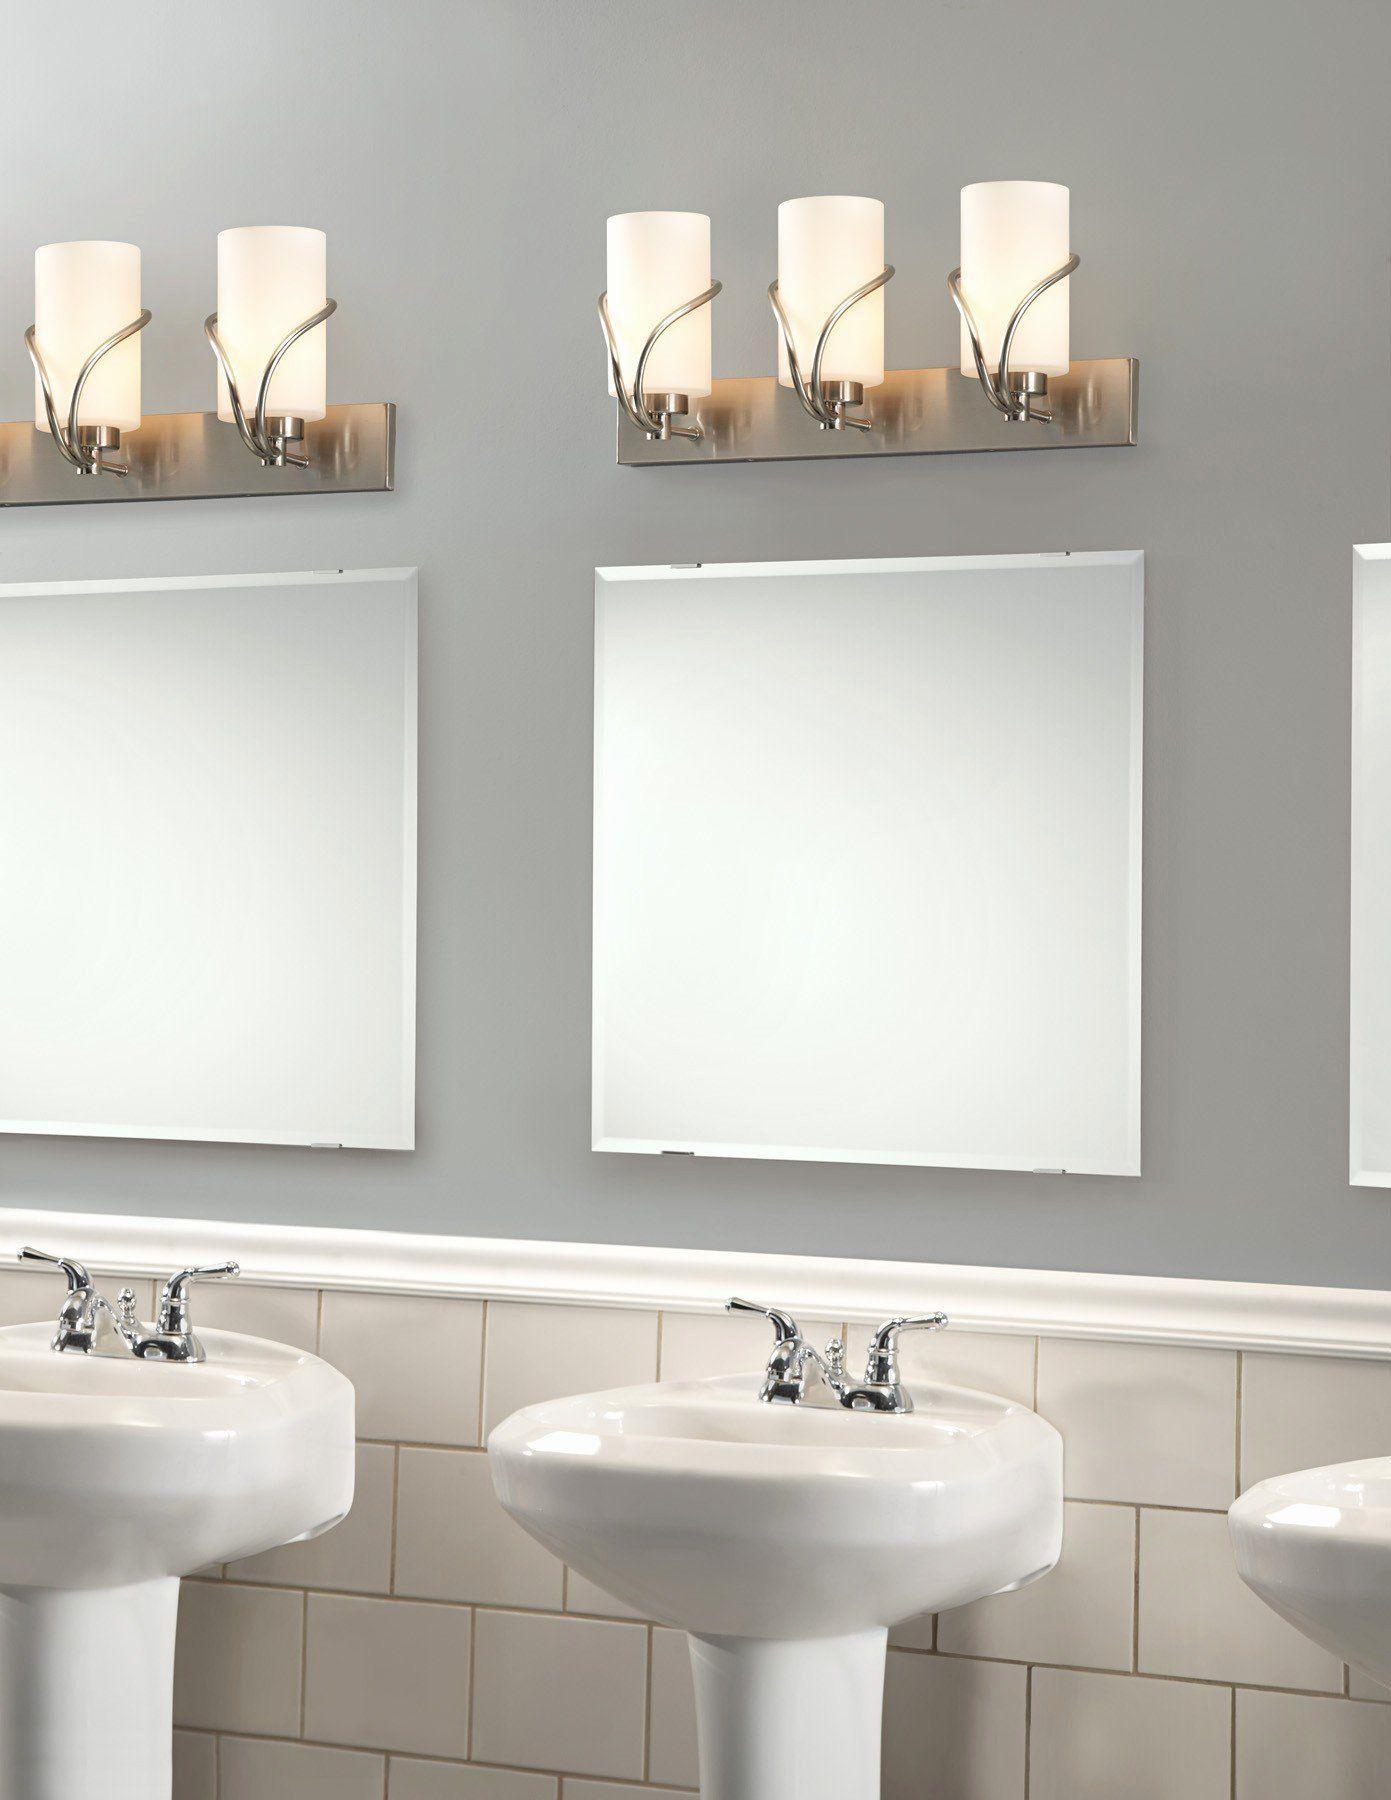 Home Depot Bathrooms Design Lovely Home Depot Bathroom Designs Bathroom Bath In 2020 Light Fixtures Bathroom Vanity Bathroom Light Fixtures Home Depot Bathroom Vanity [ 1800 x 1391 Pixel ]